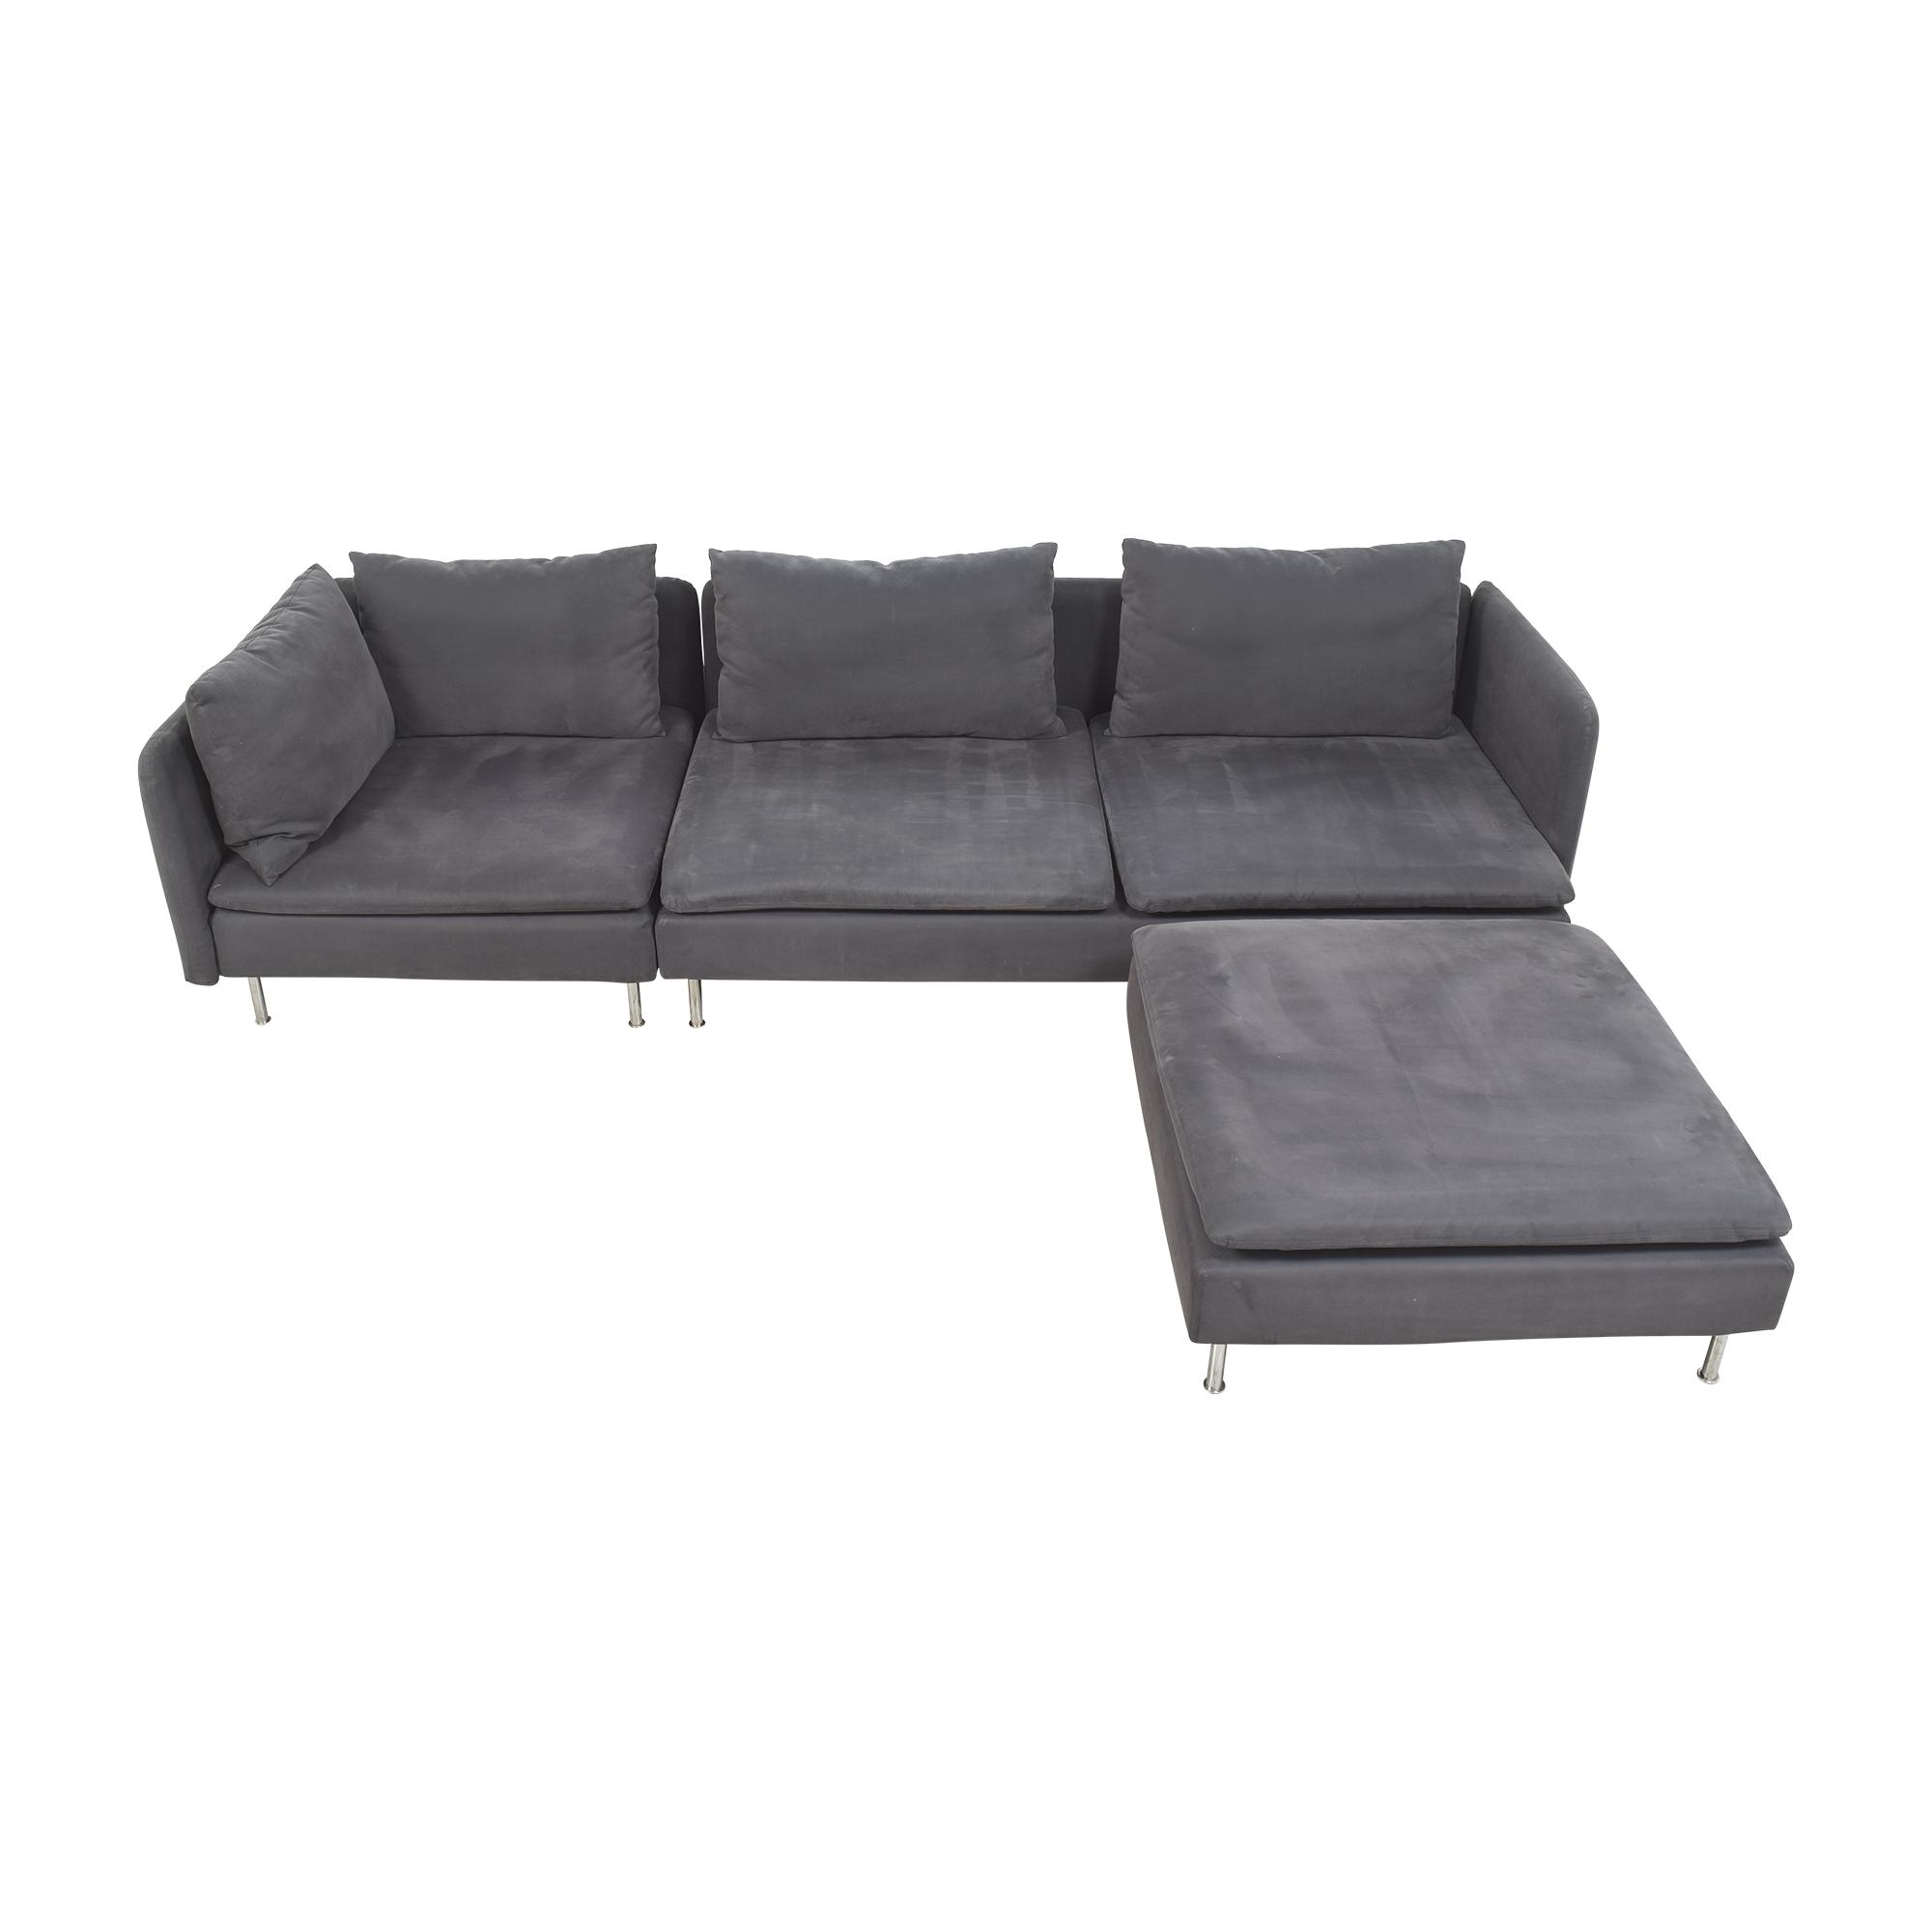 IKEA IKEA SÖDERHAMN Sectional Sofa with Ottoman price